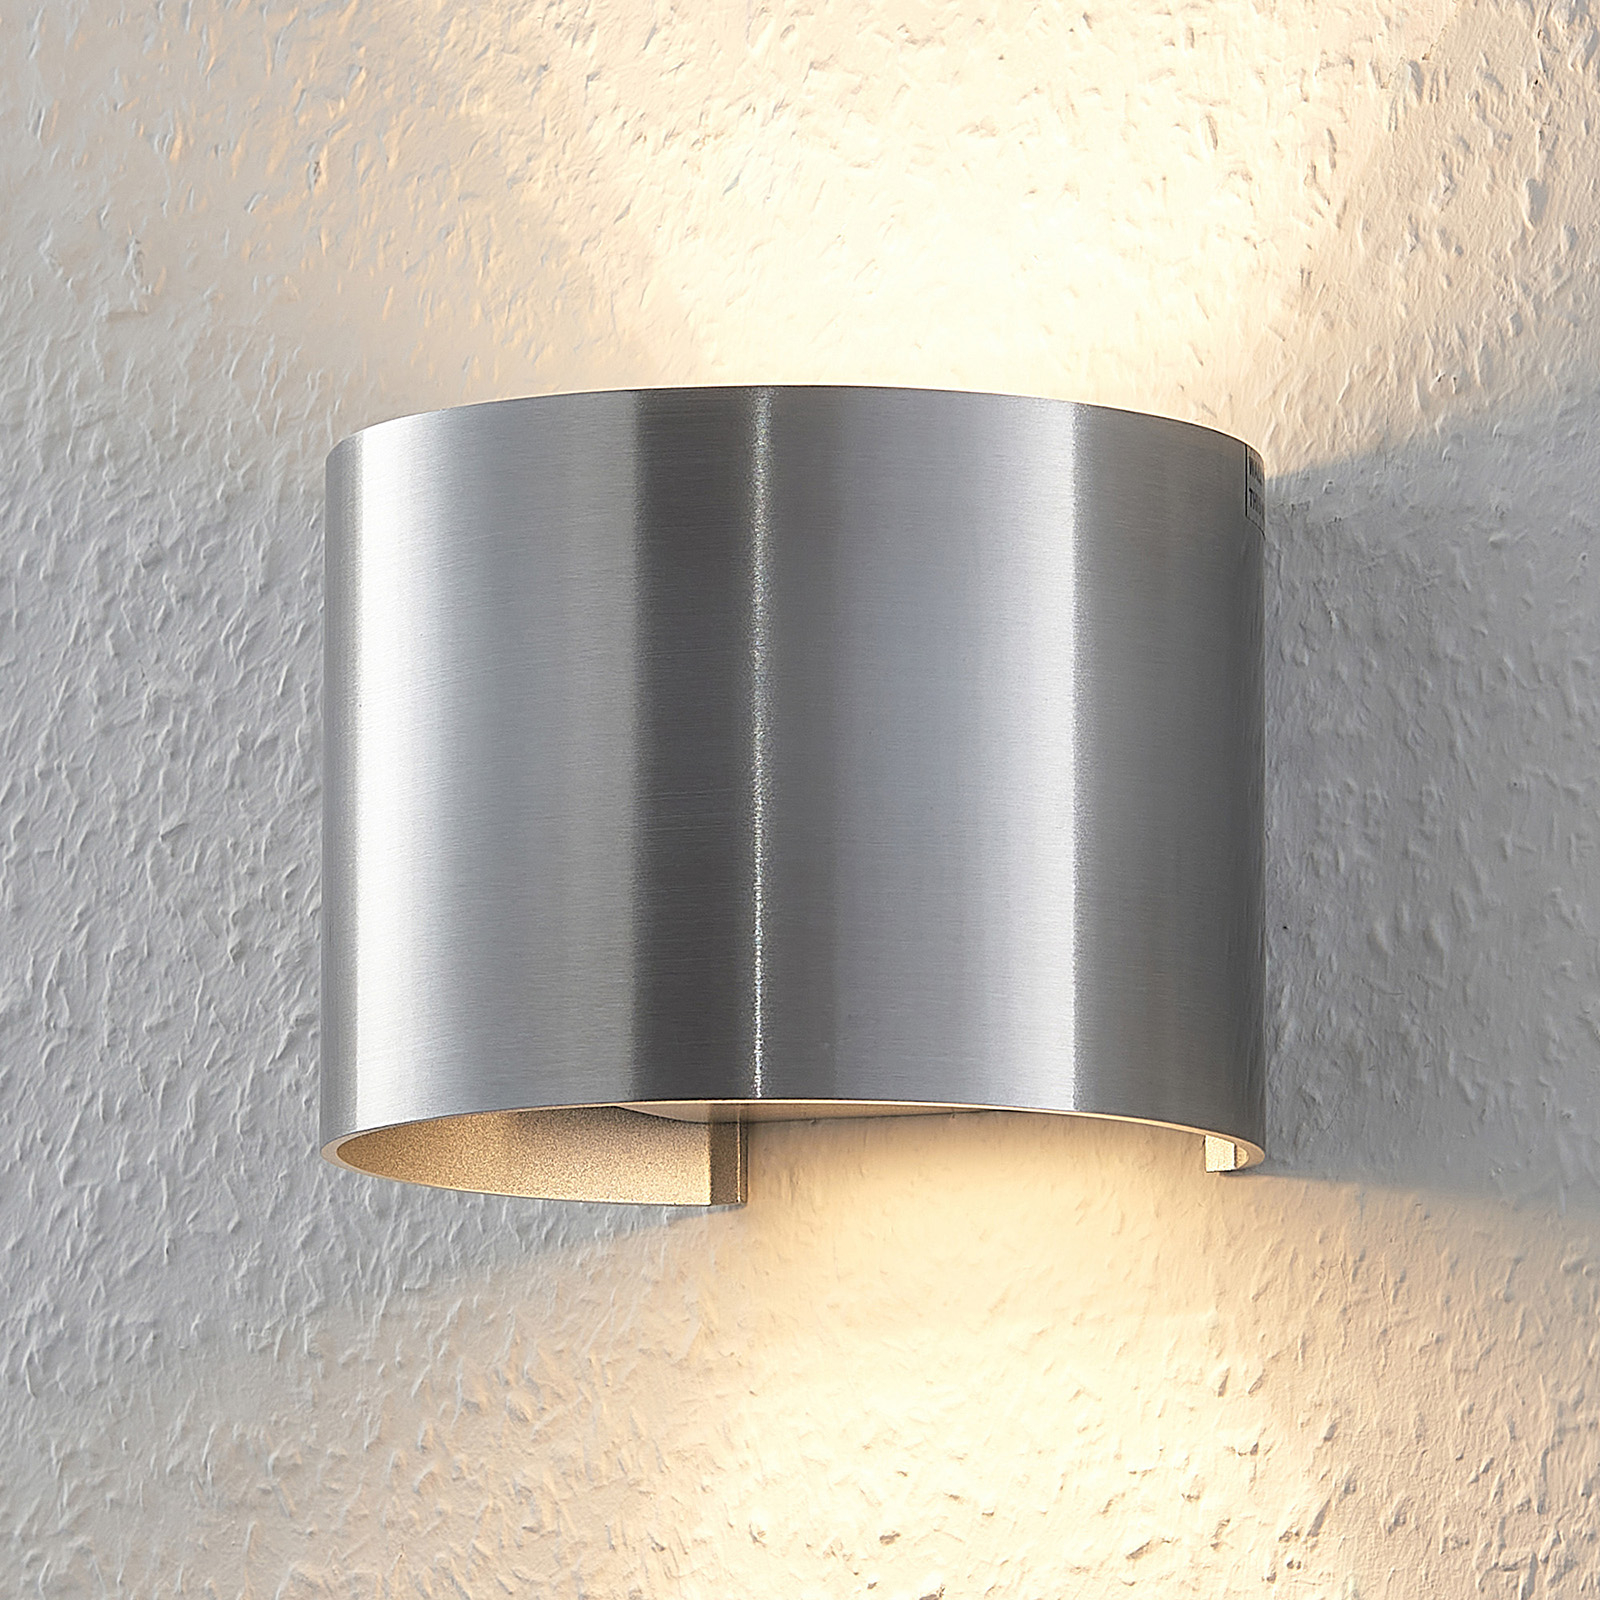 Aluminium LED wandlamp Zuzana in ronde vorm